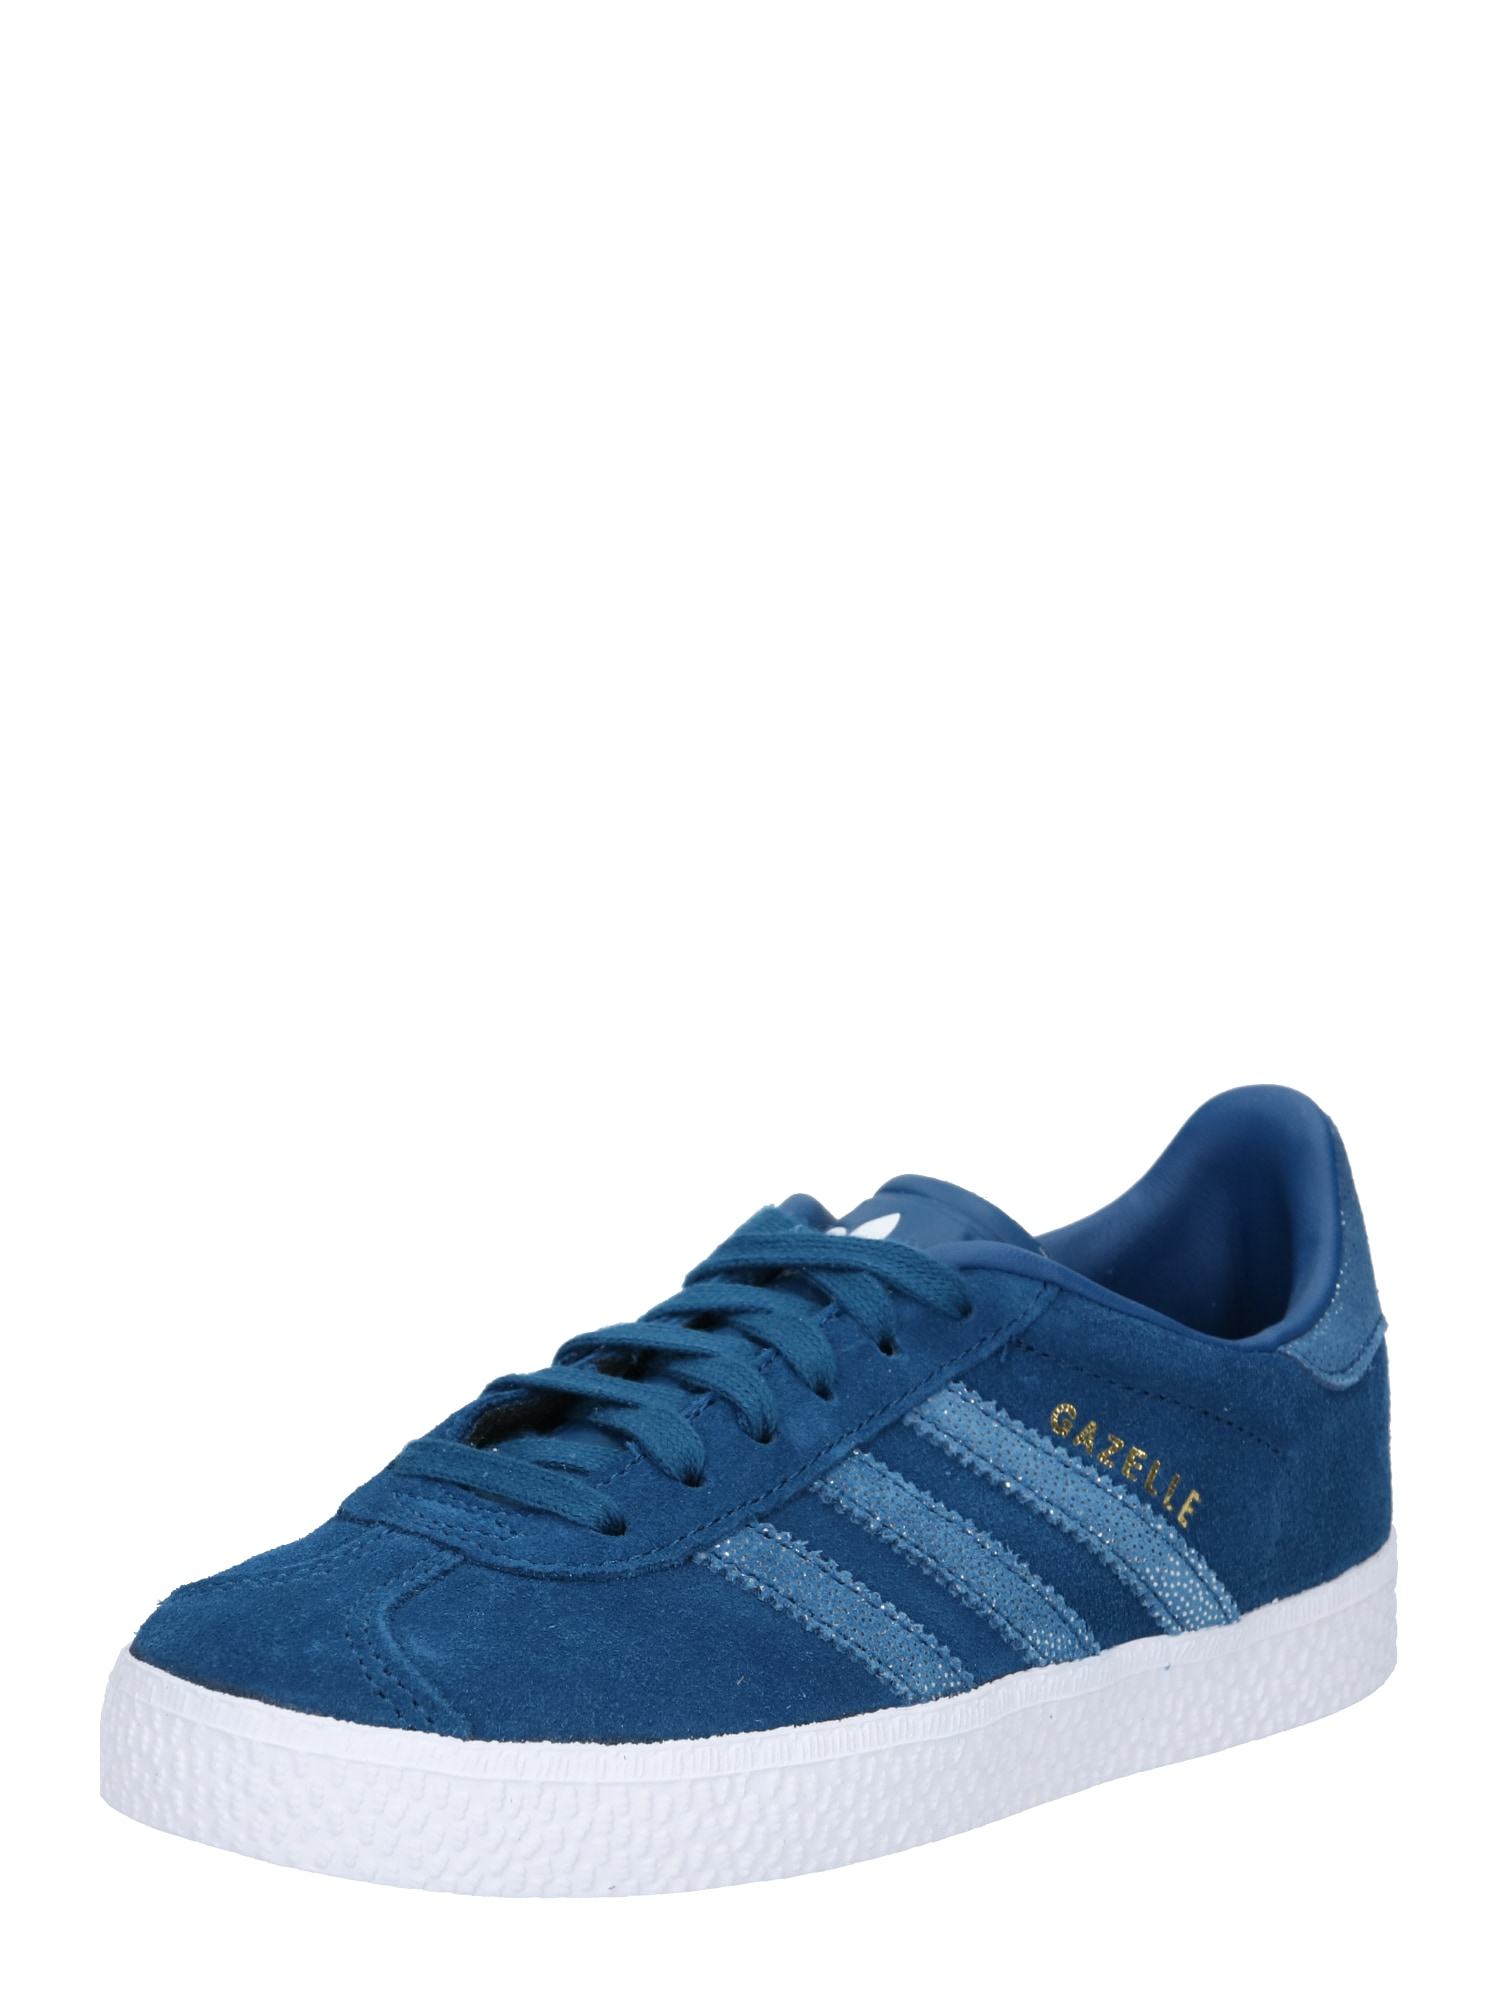 ADIDAS ORIGINALS, Meisjes Sneakers 'Gazelle', marine